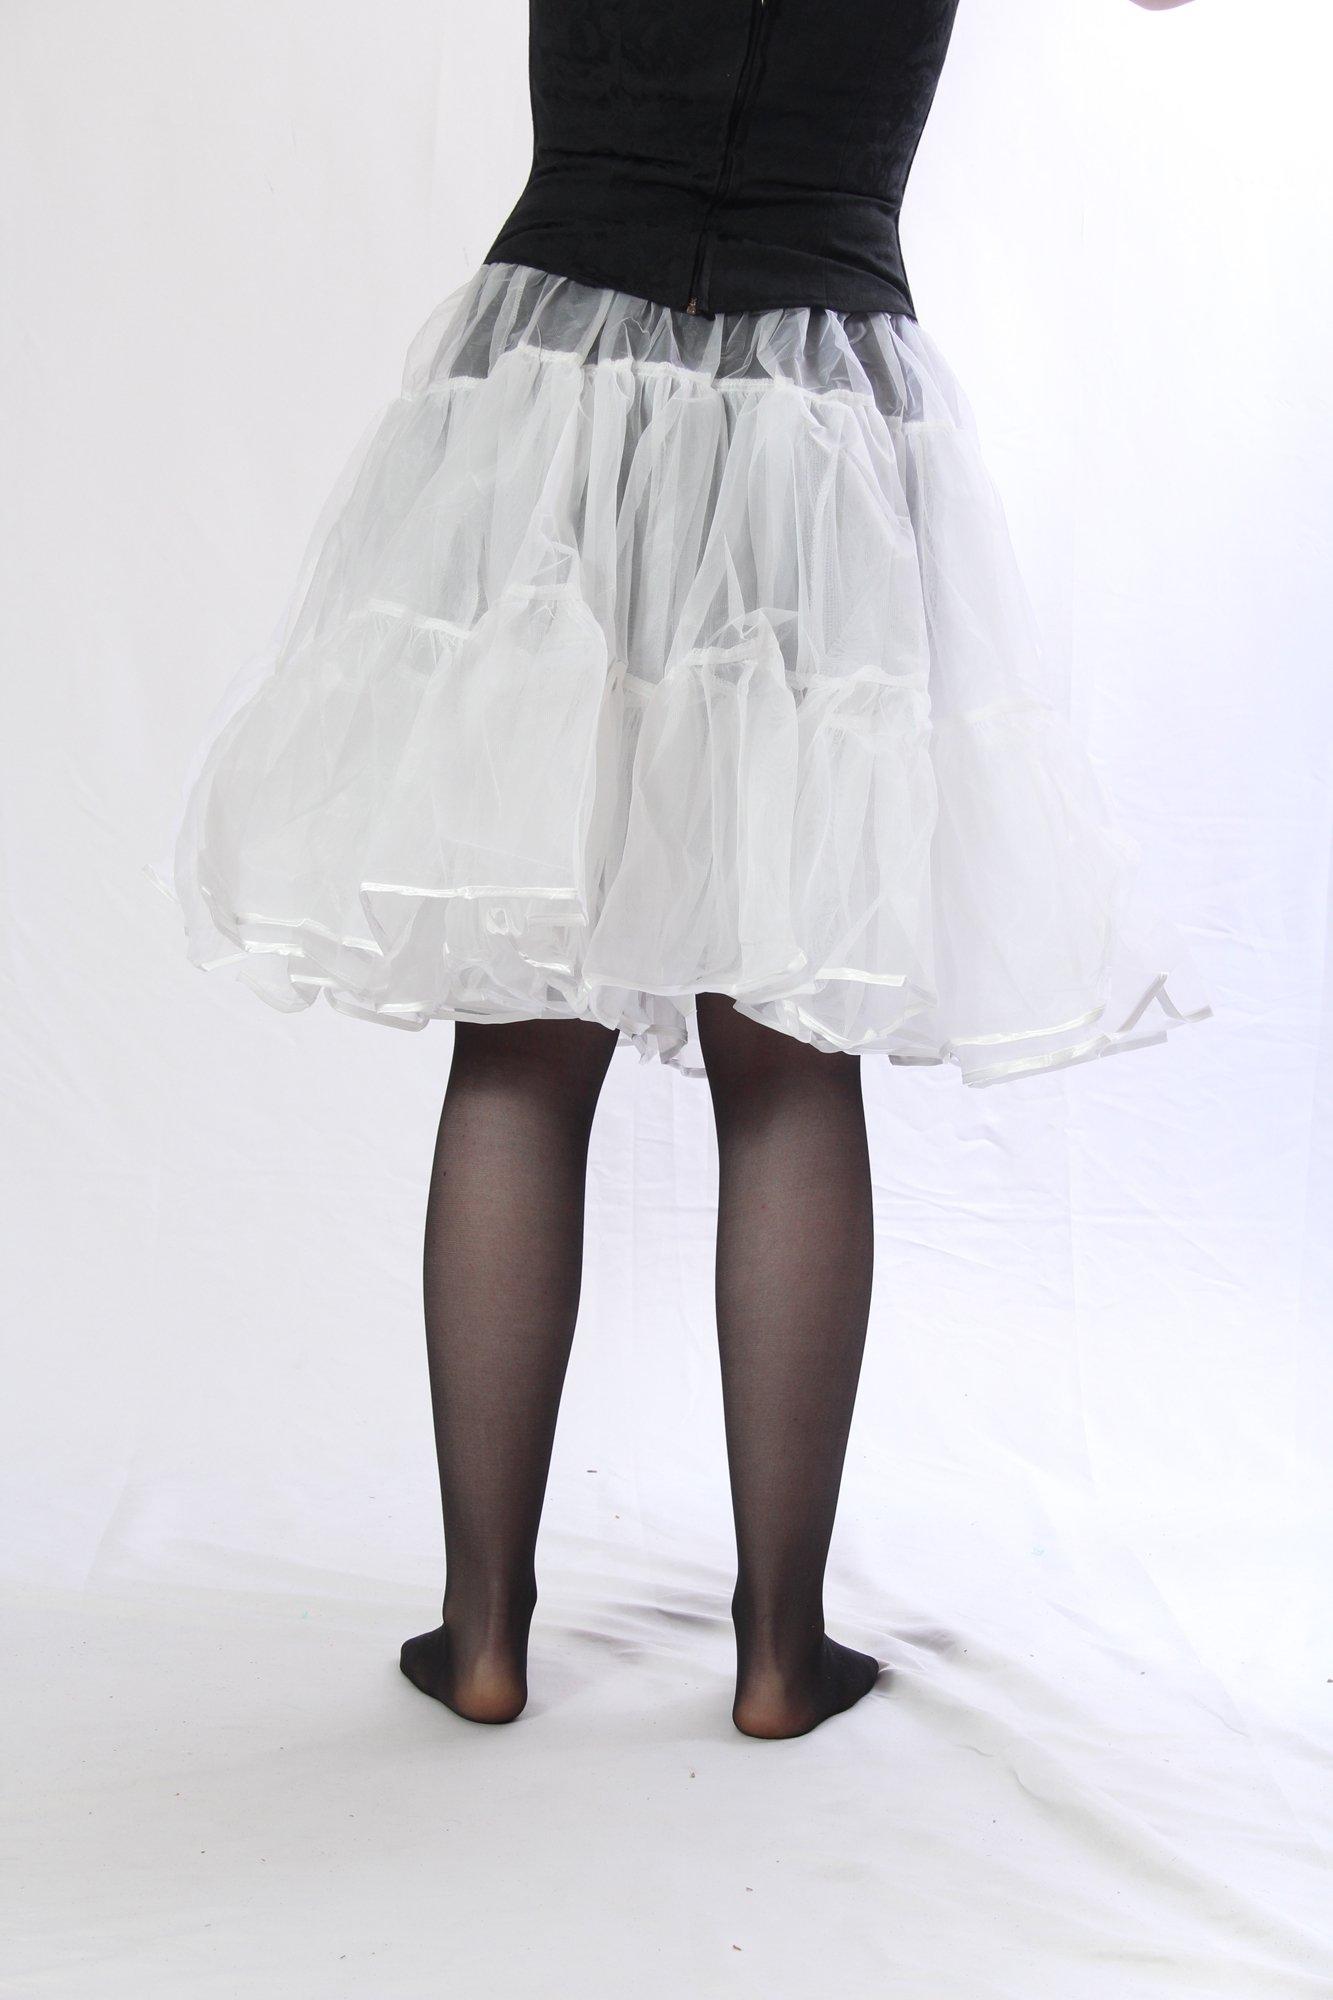 Petticoat Crinoline. Perfect Petticoat Skirt for Vintage Dresses, Petticoat Dresses, Poodle Skirts as Rockabilly Adult Tutu Skirt. Tulle Fabric; 22' Length - White Petticoat by BellaSous (Image #5)